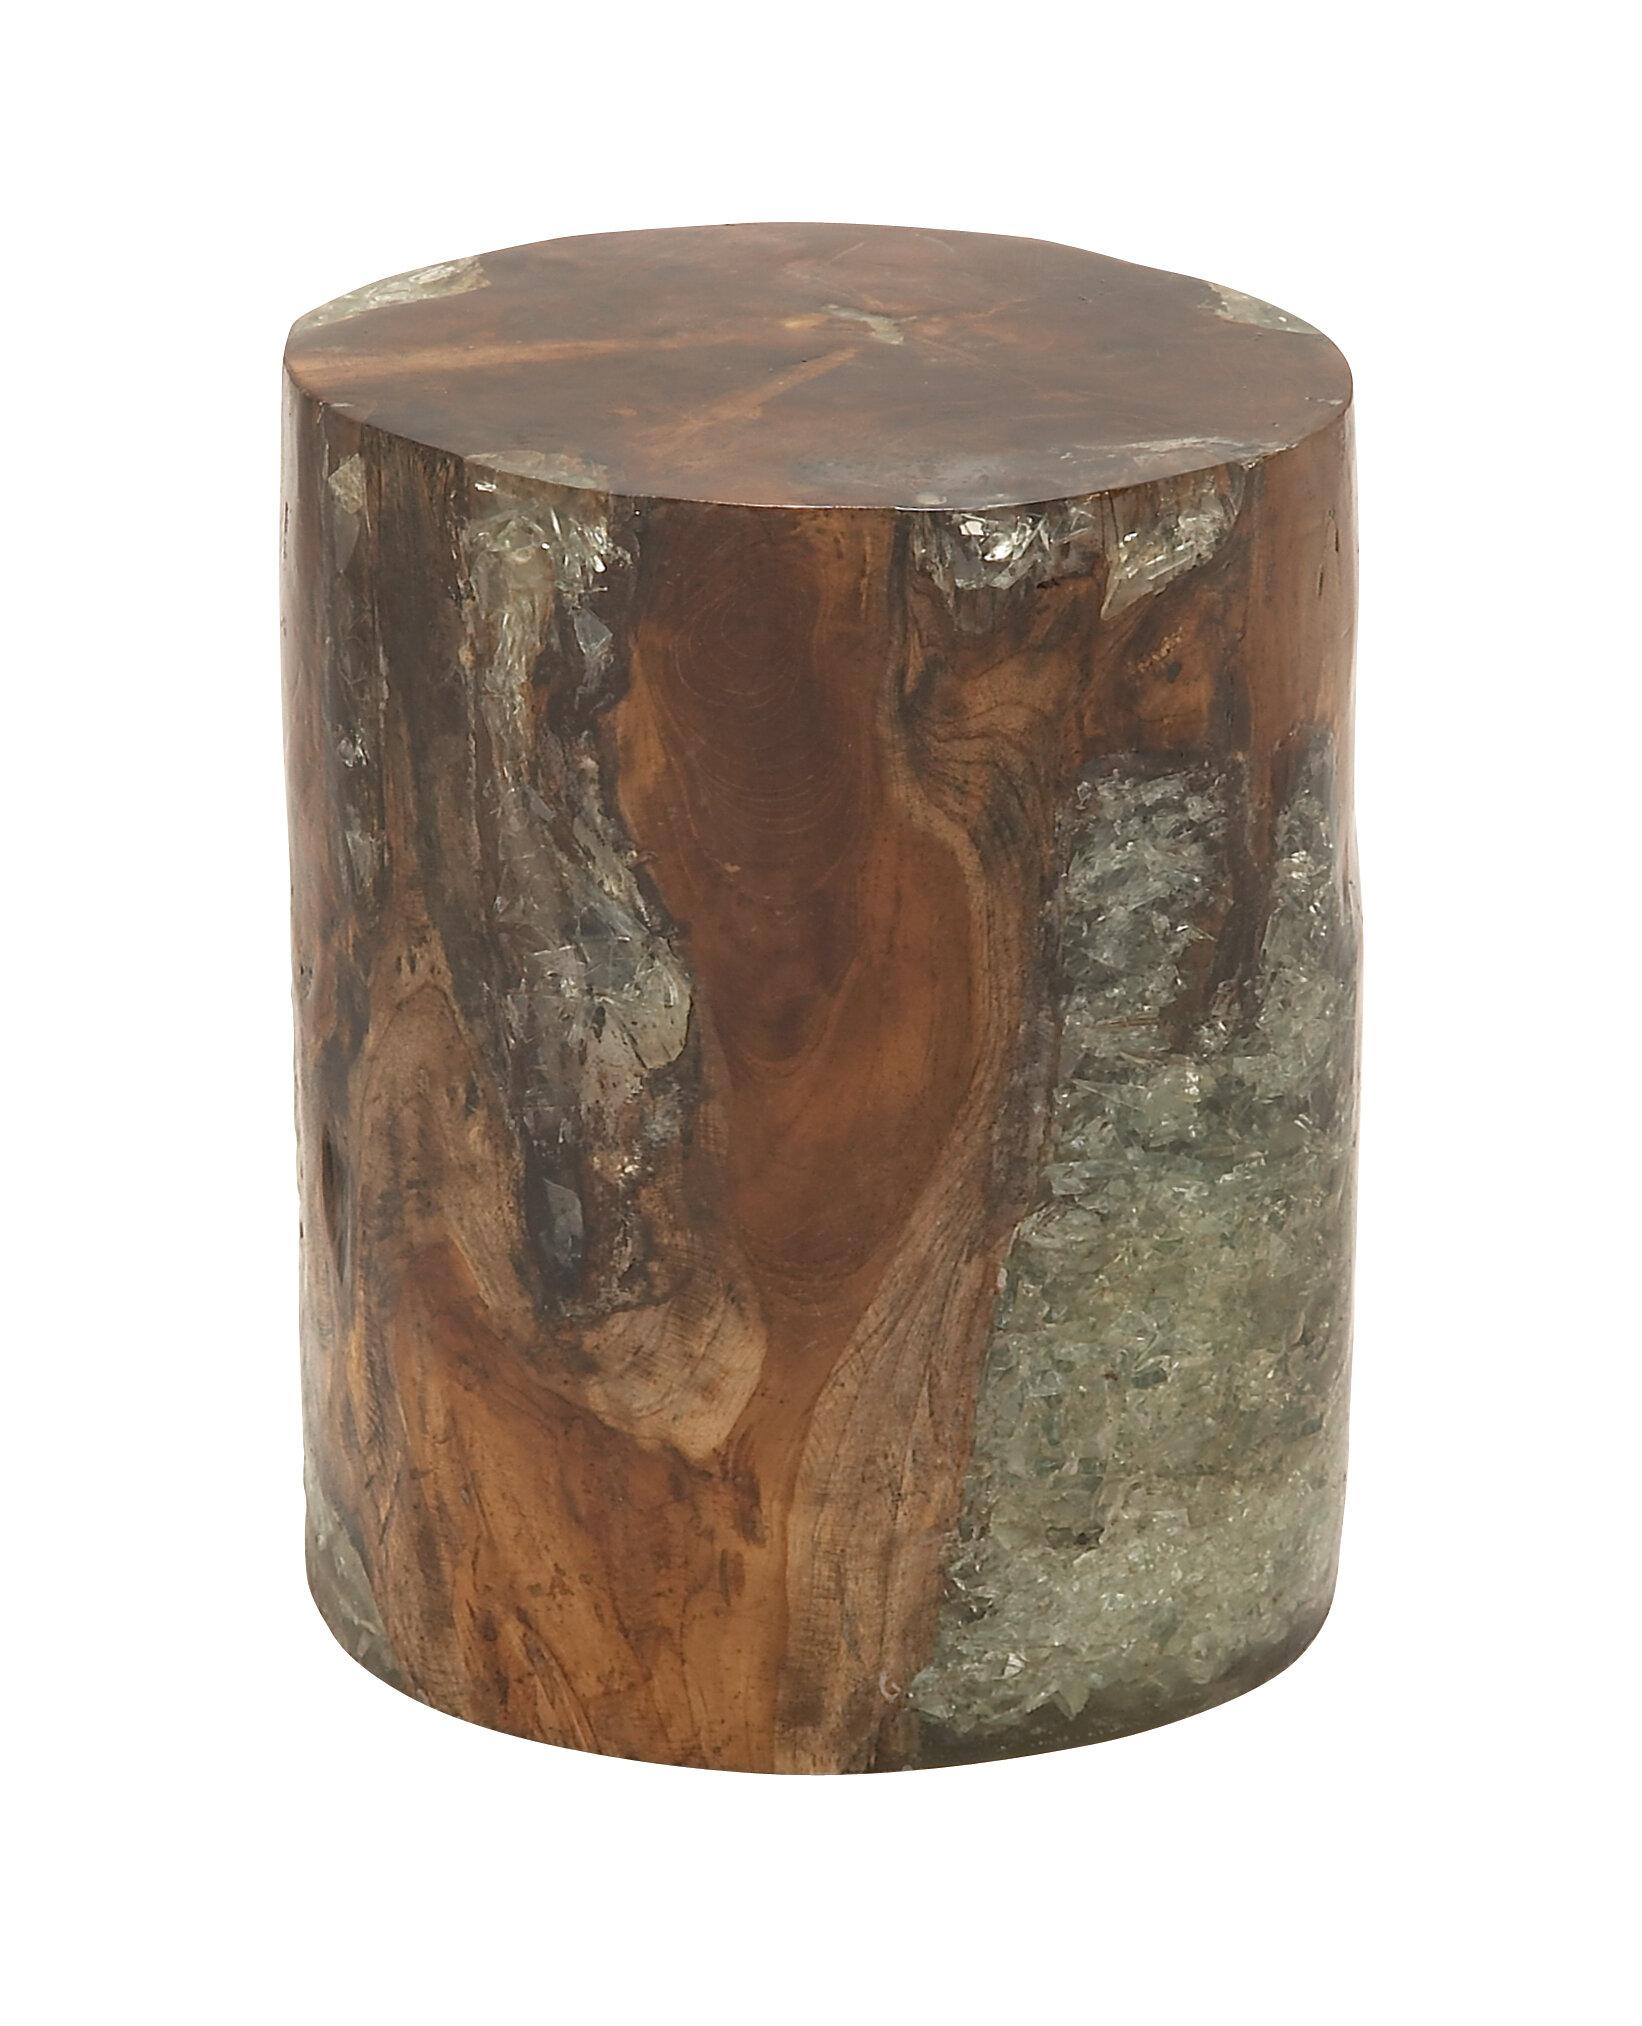 Wood Teak and Resin Garden Stool & Reviews   AllModern